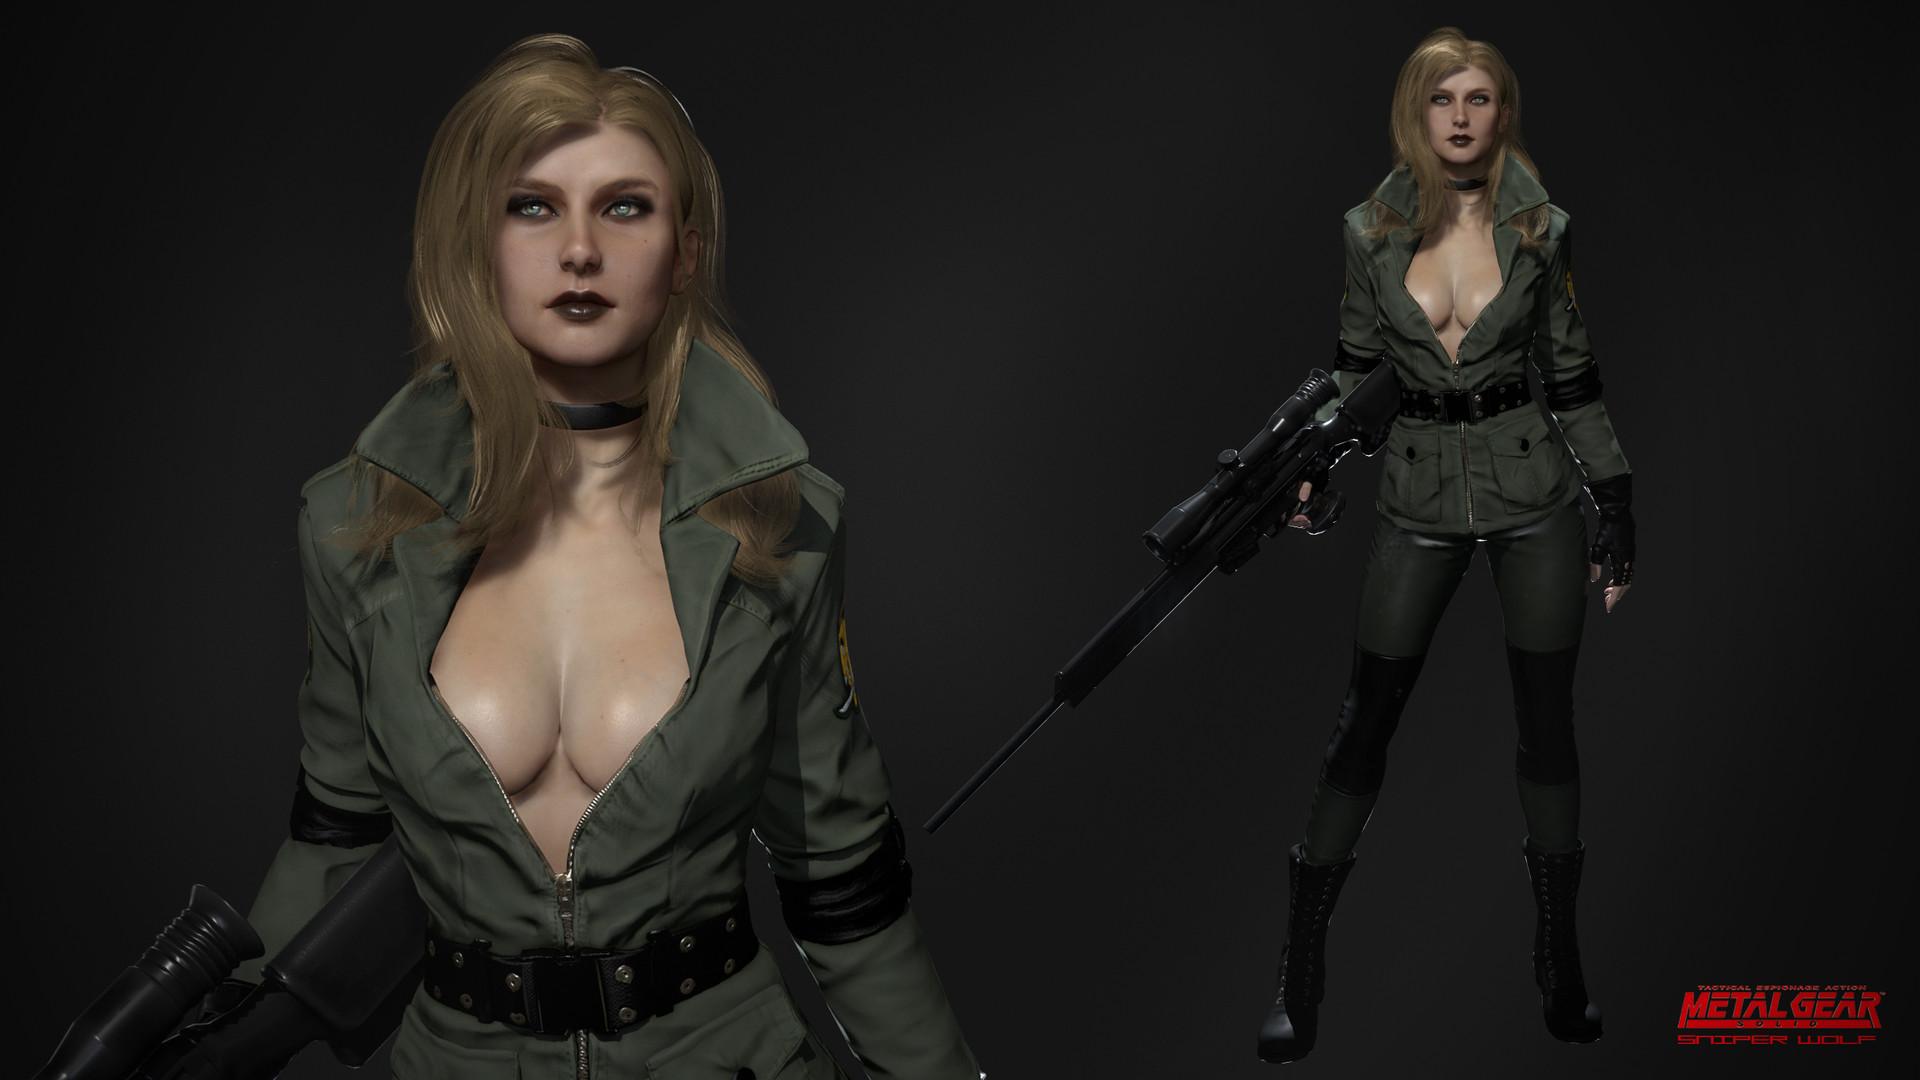 Lara 3d tumblr -youtube hentia clip